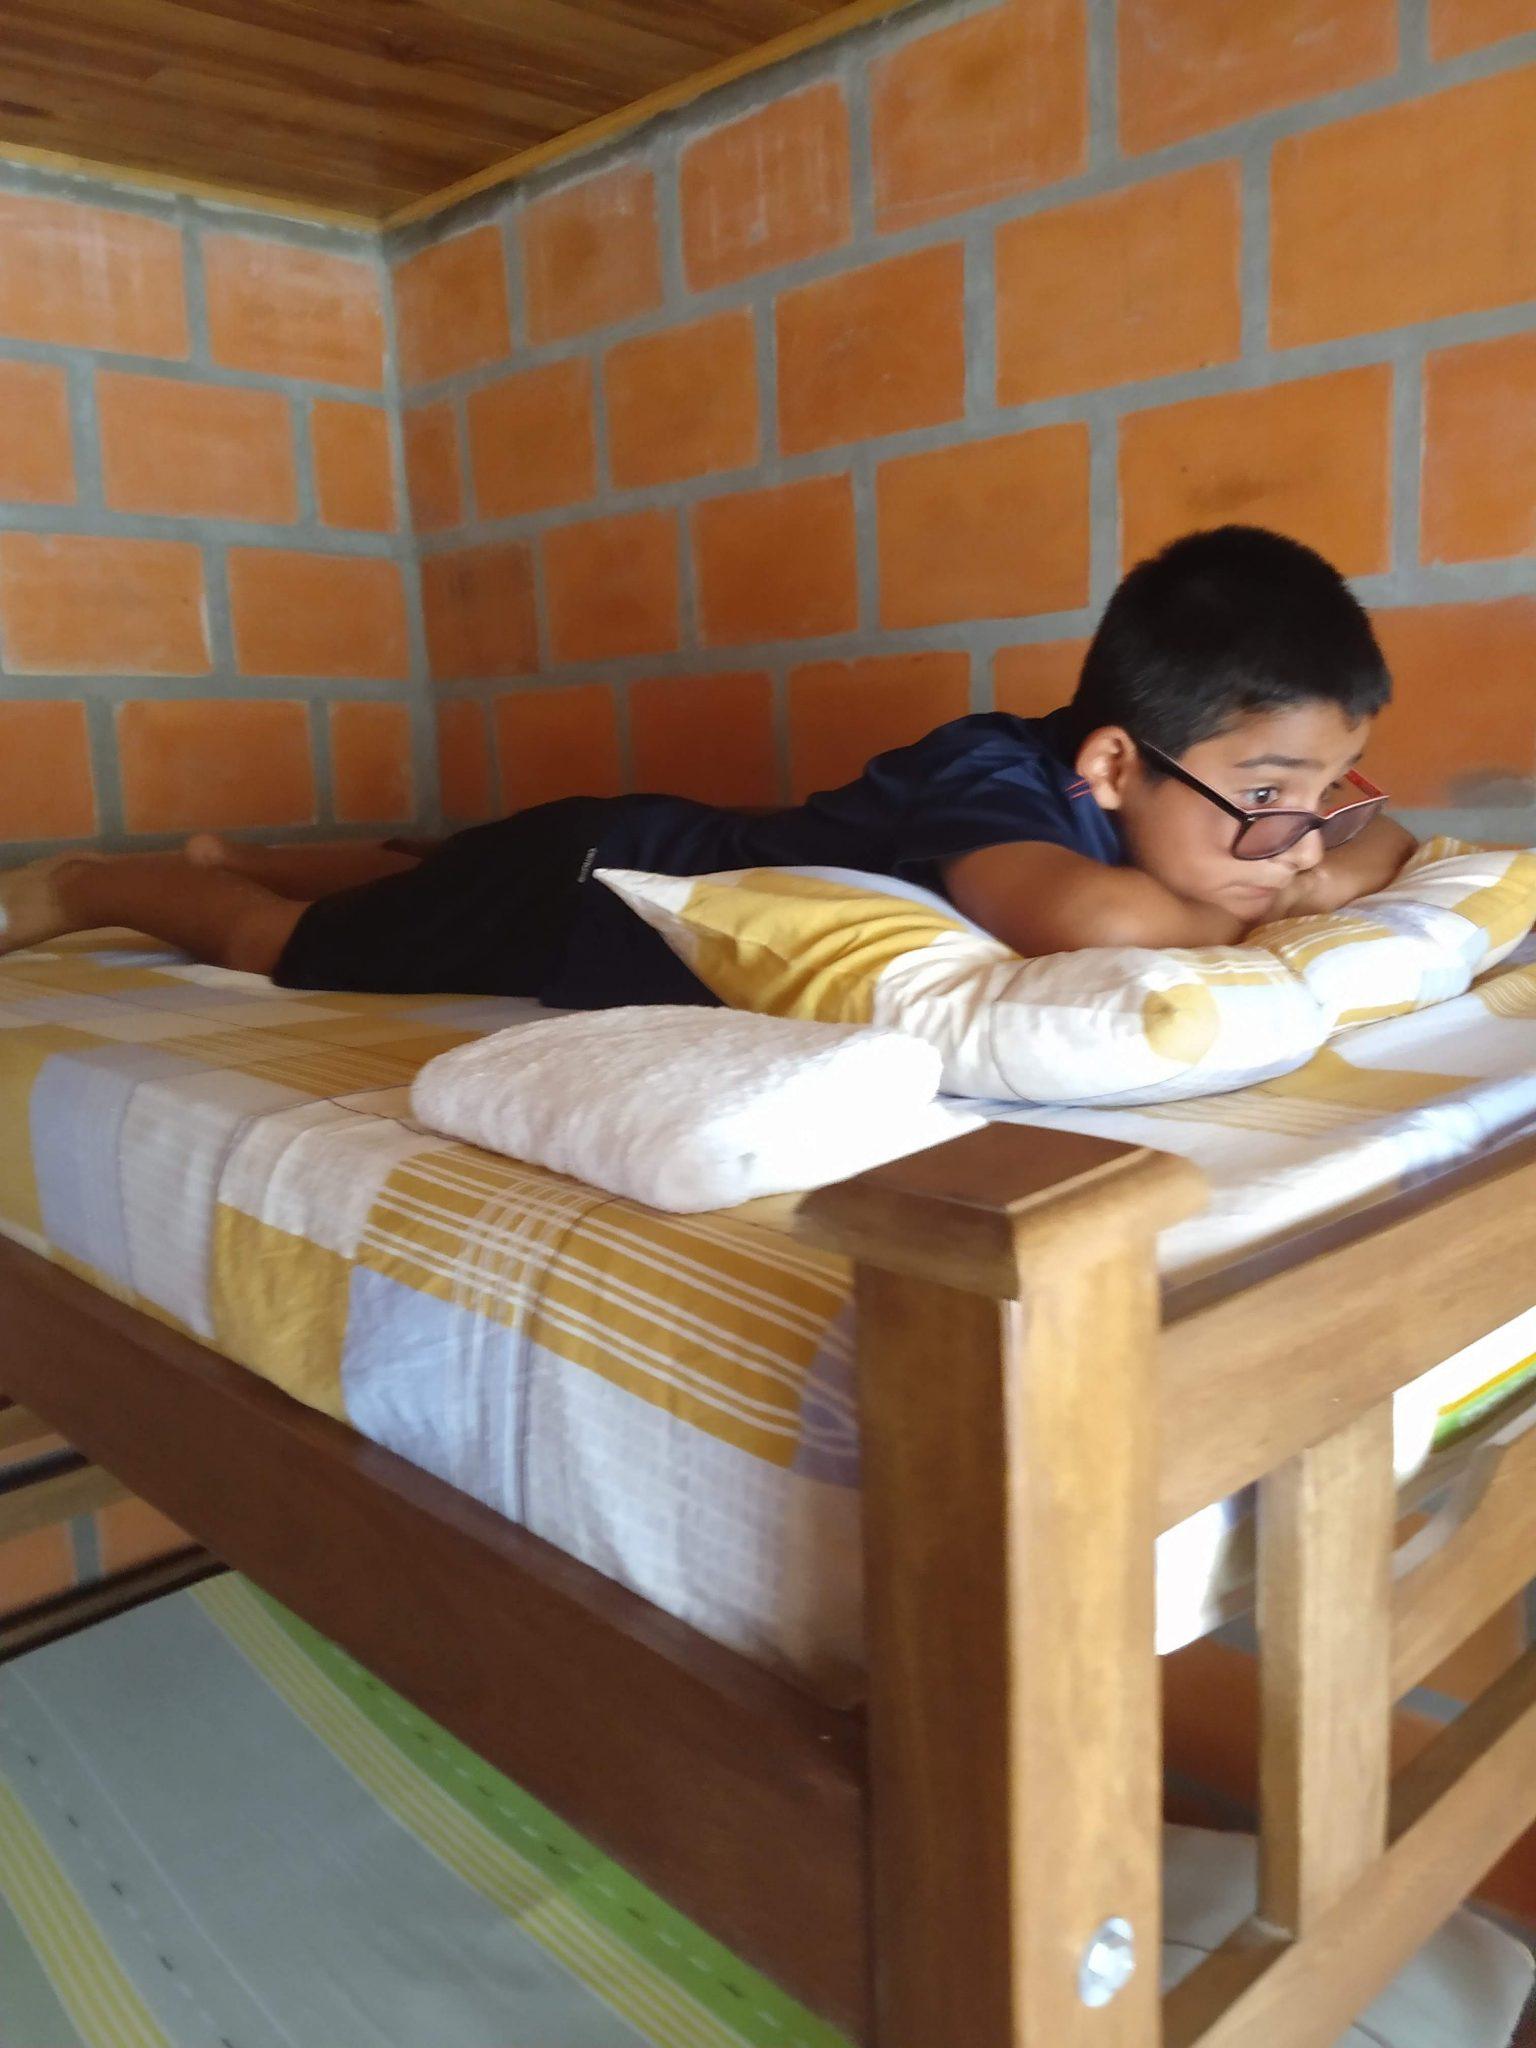 Mateo lying on his bed at Cabanas el Descanso y Zamukia